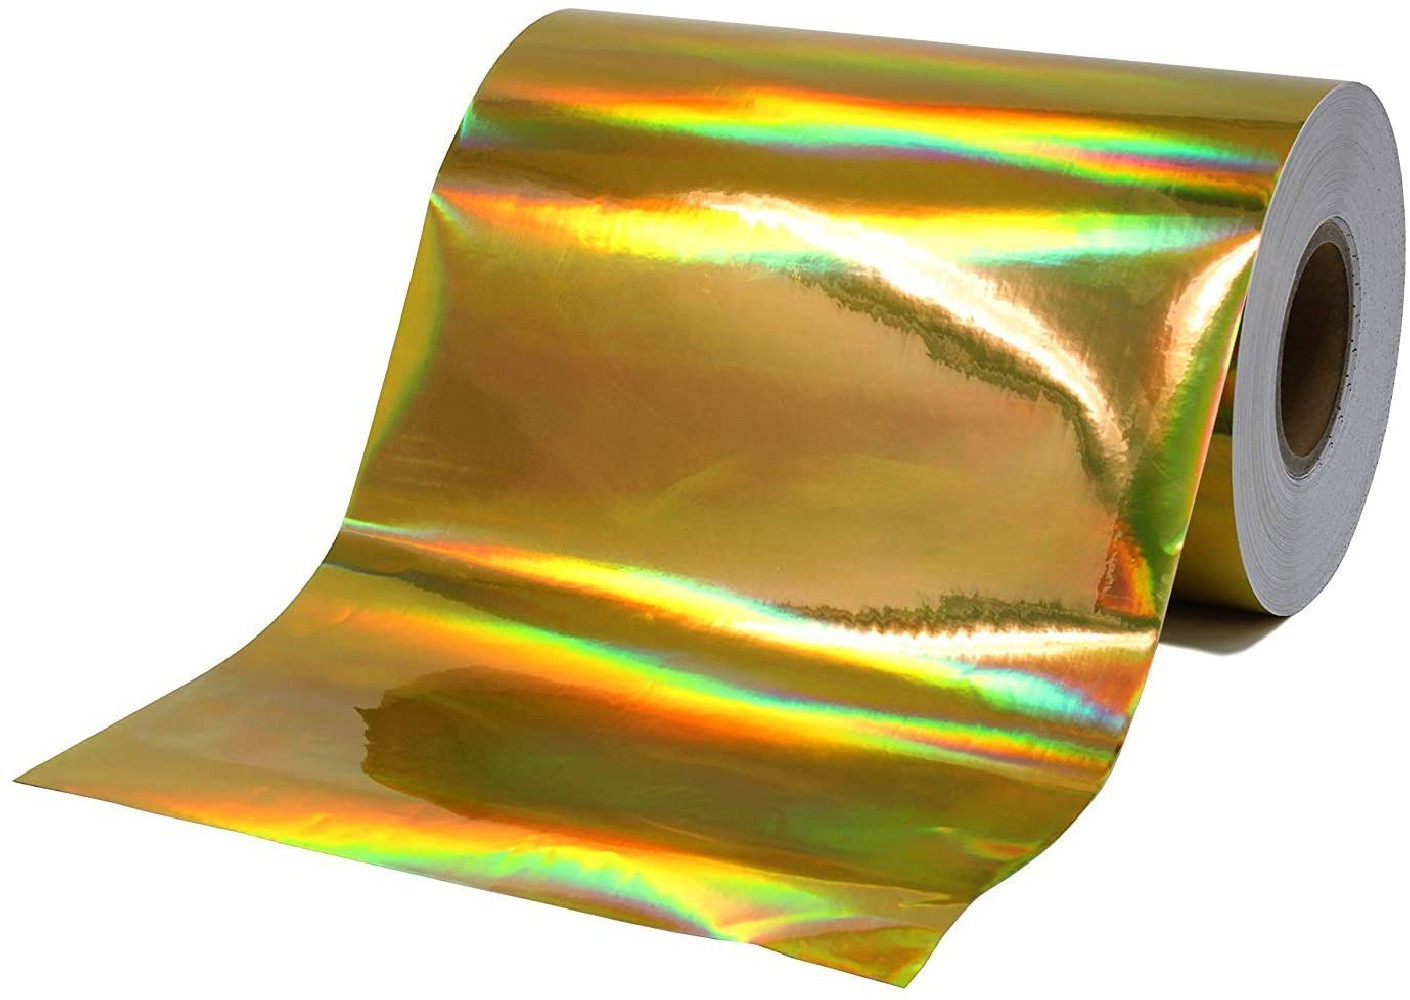 Vinil Adesivo Envelopamento Holografico Ouro - 60 CM